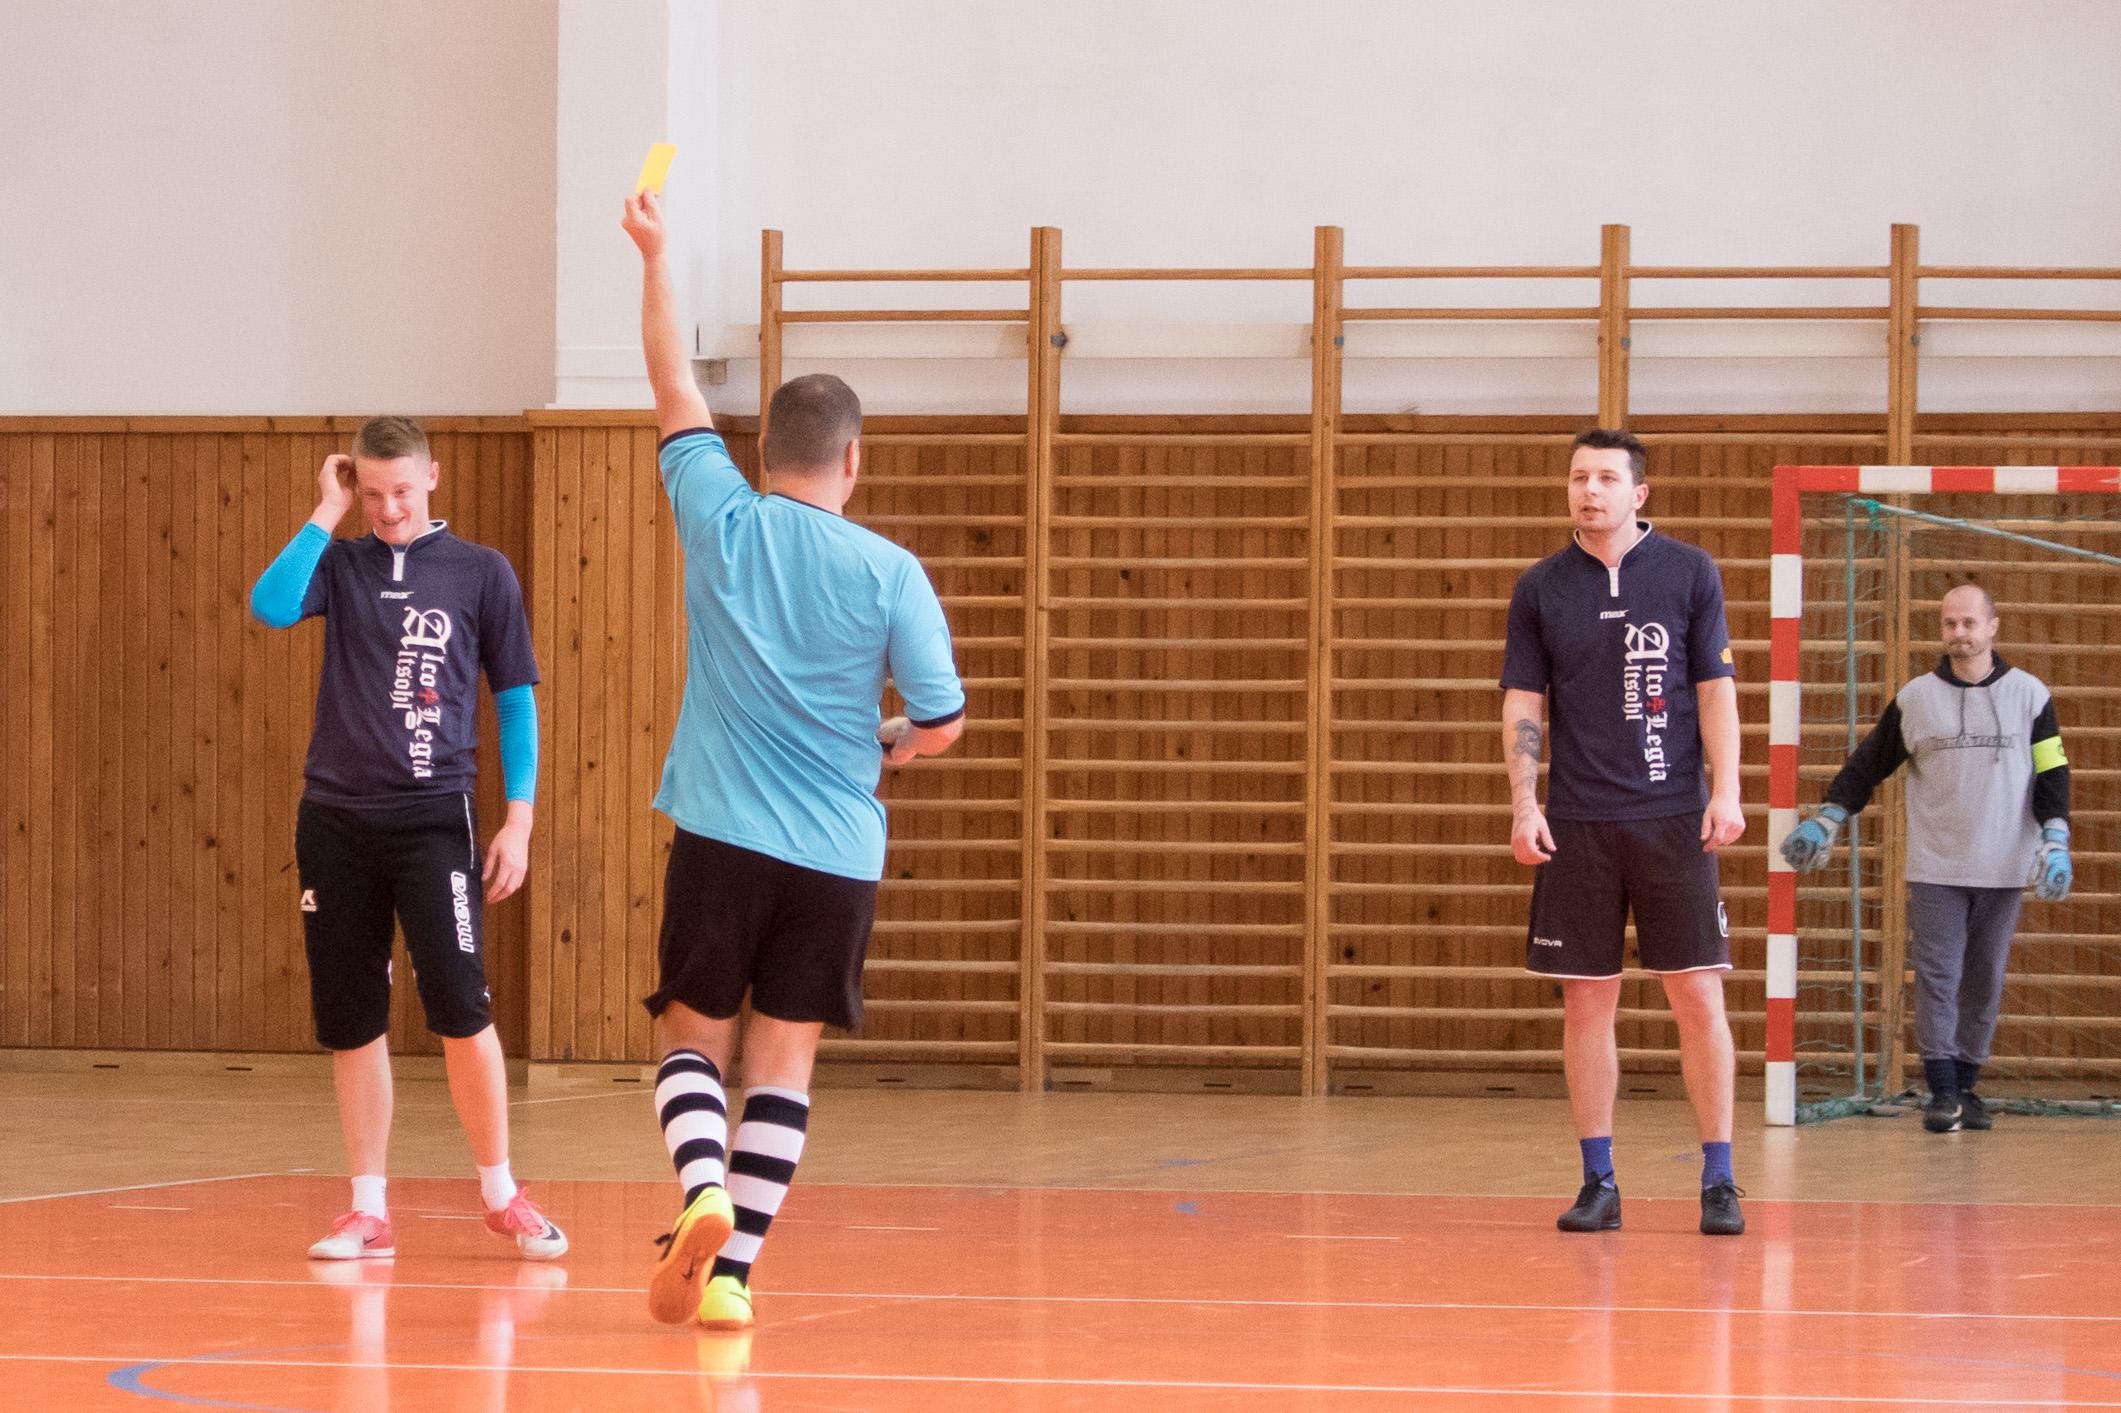 zimny-turnaj-limfu-zv-20